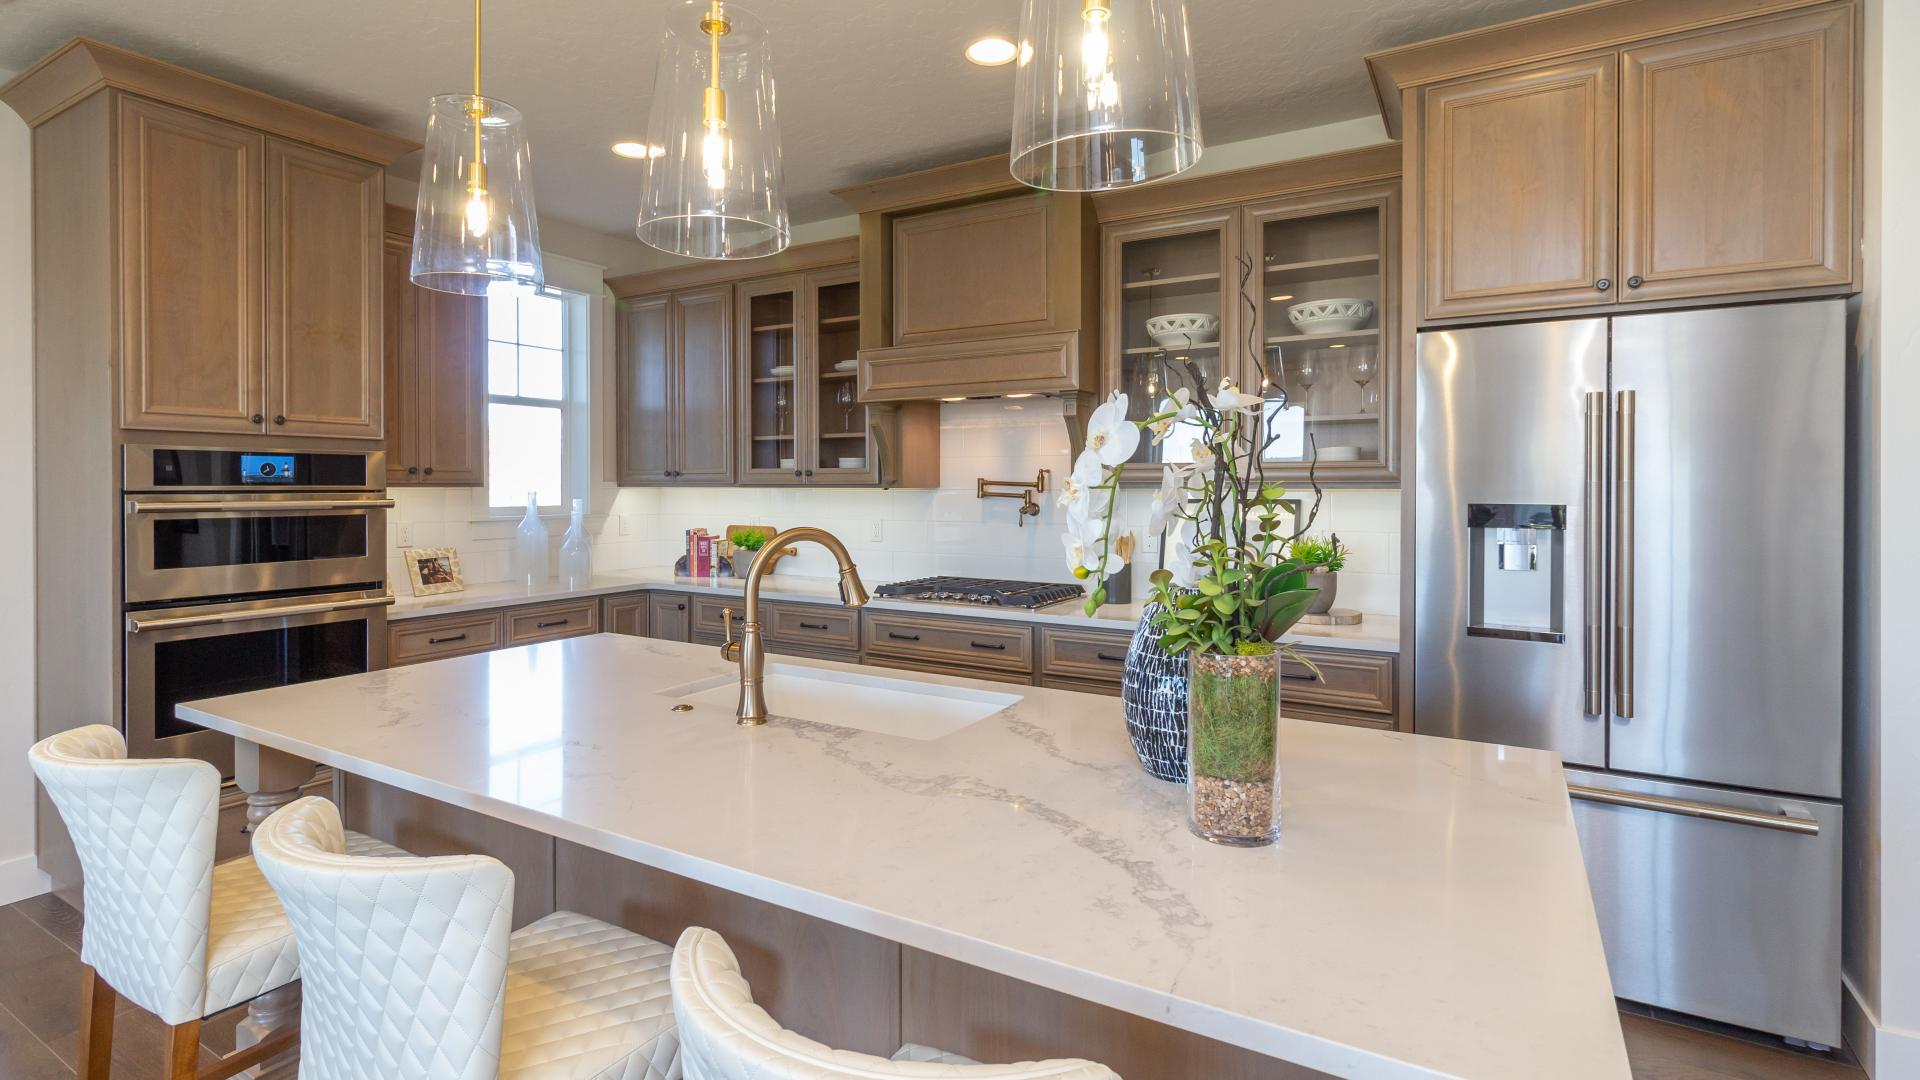 Beautifully designed kitchens